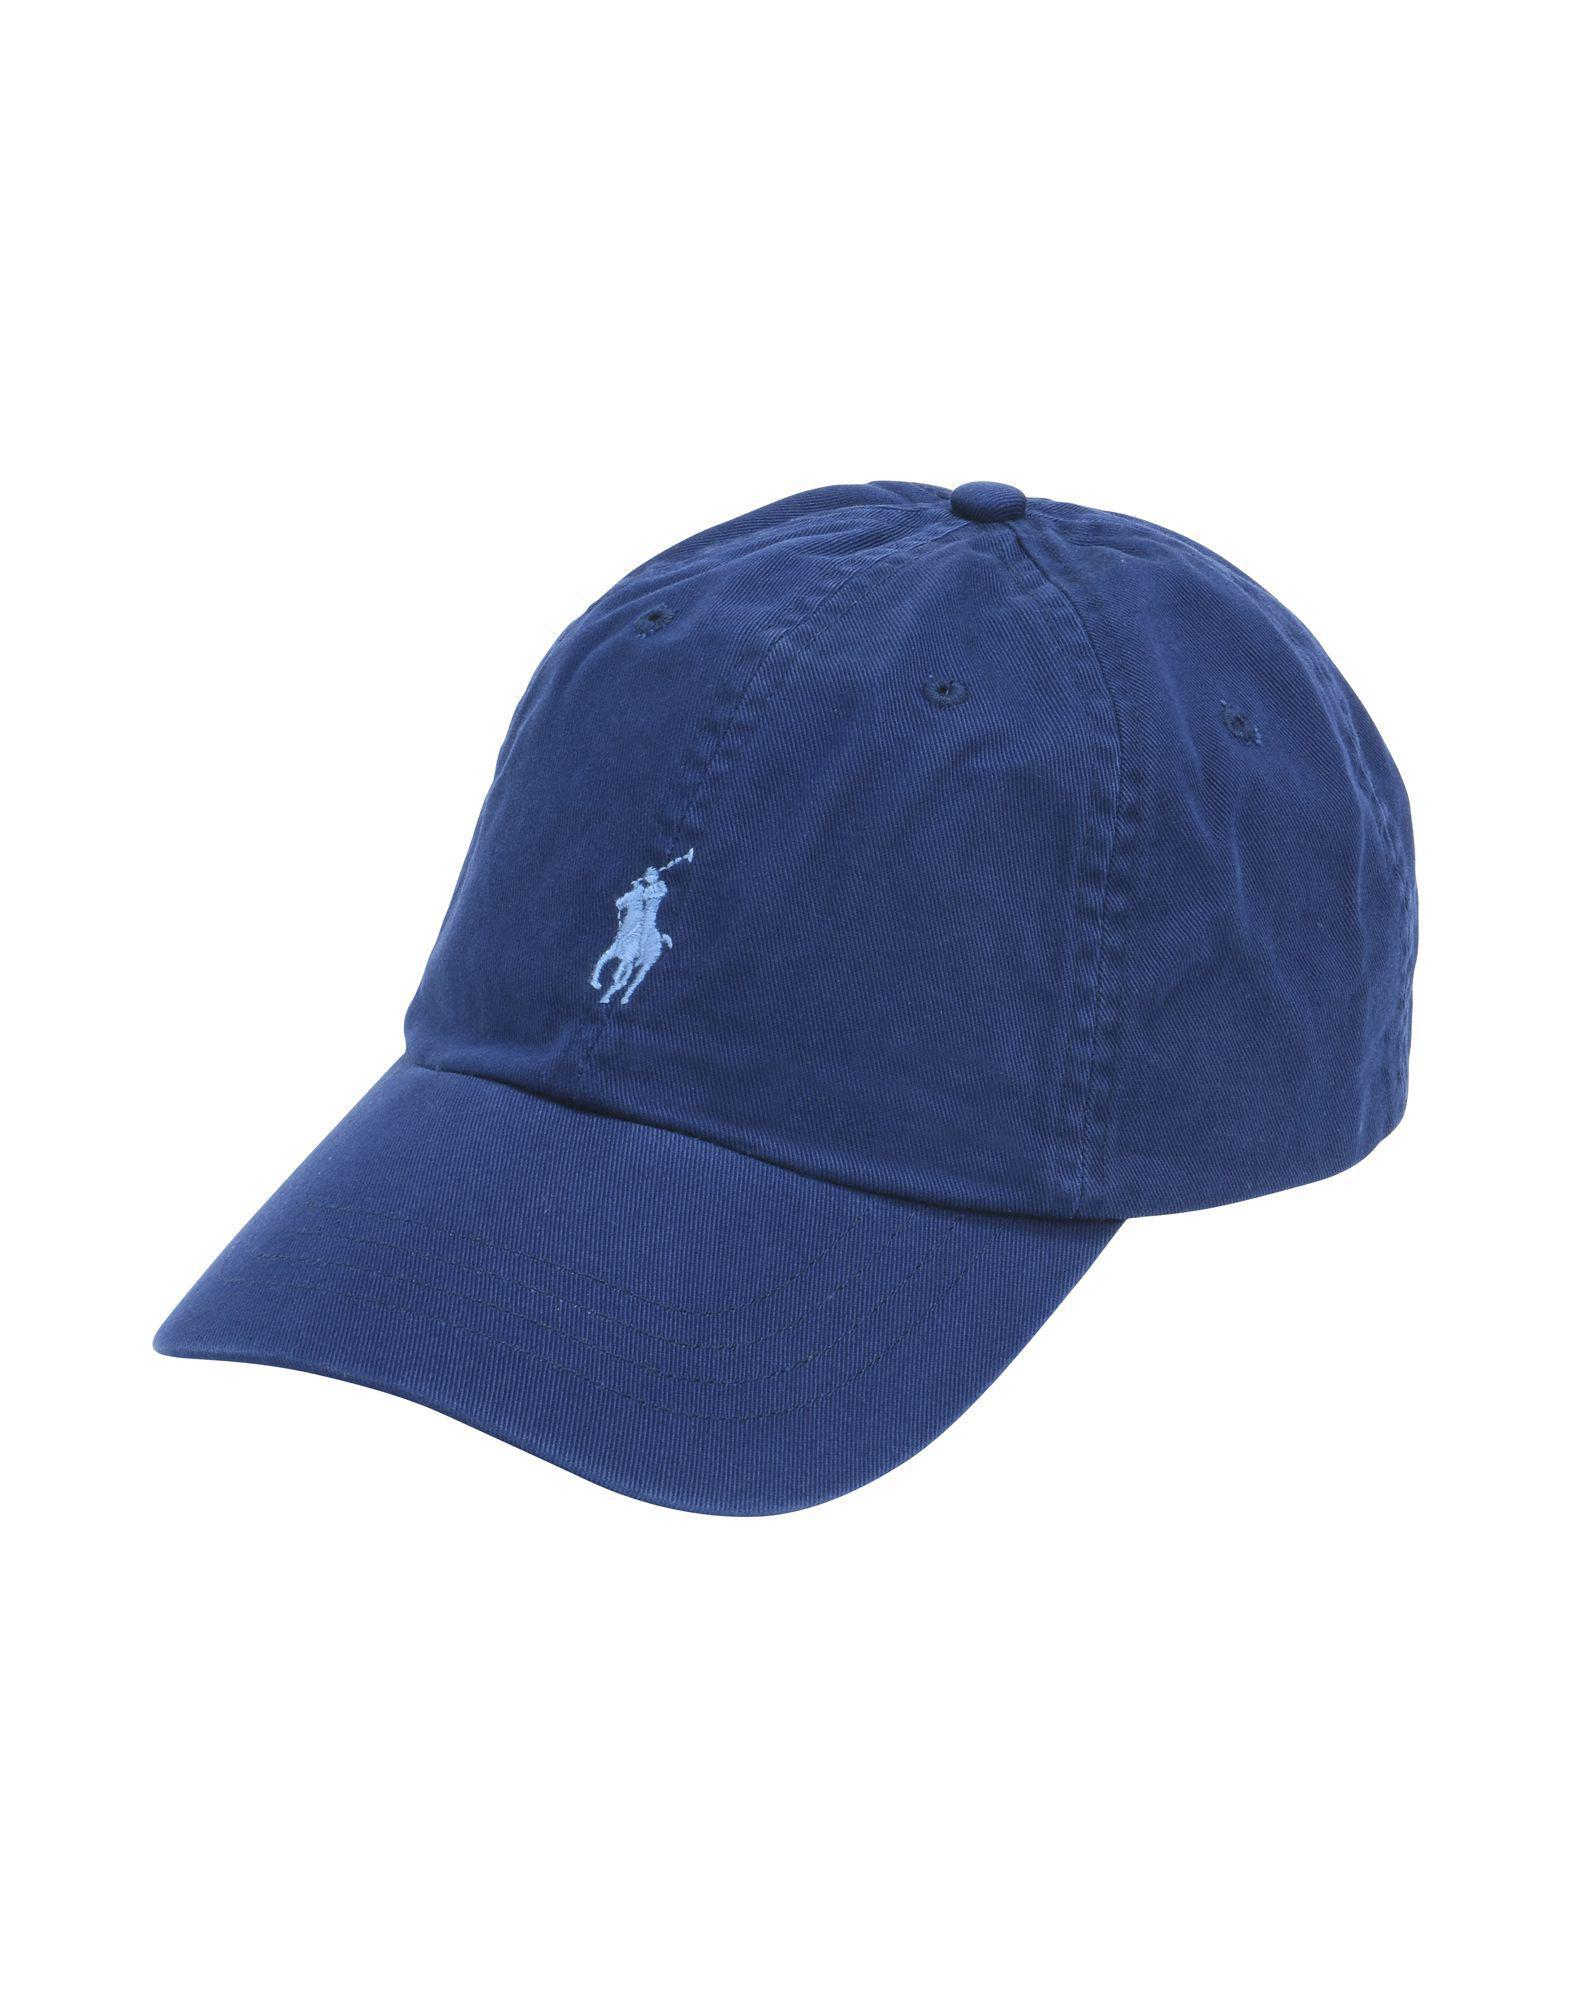 Polo Ralph Lauren Hat in Blue for Men - Lyst bd95fdf3e9fe